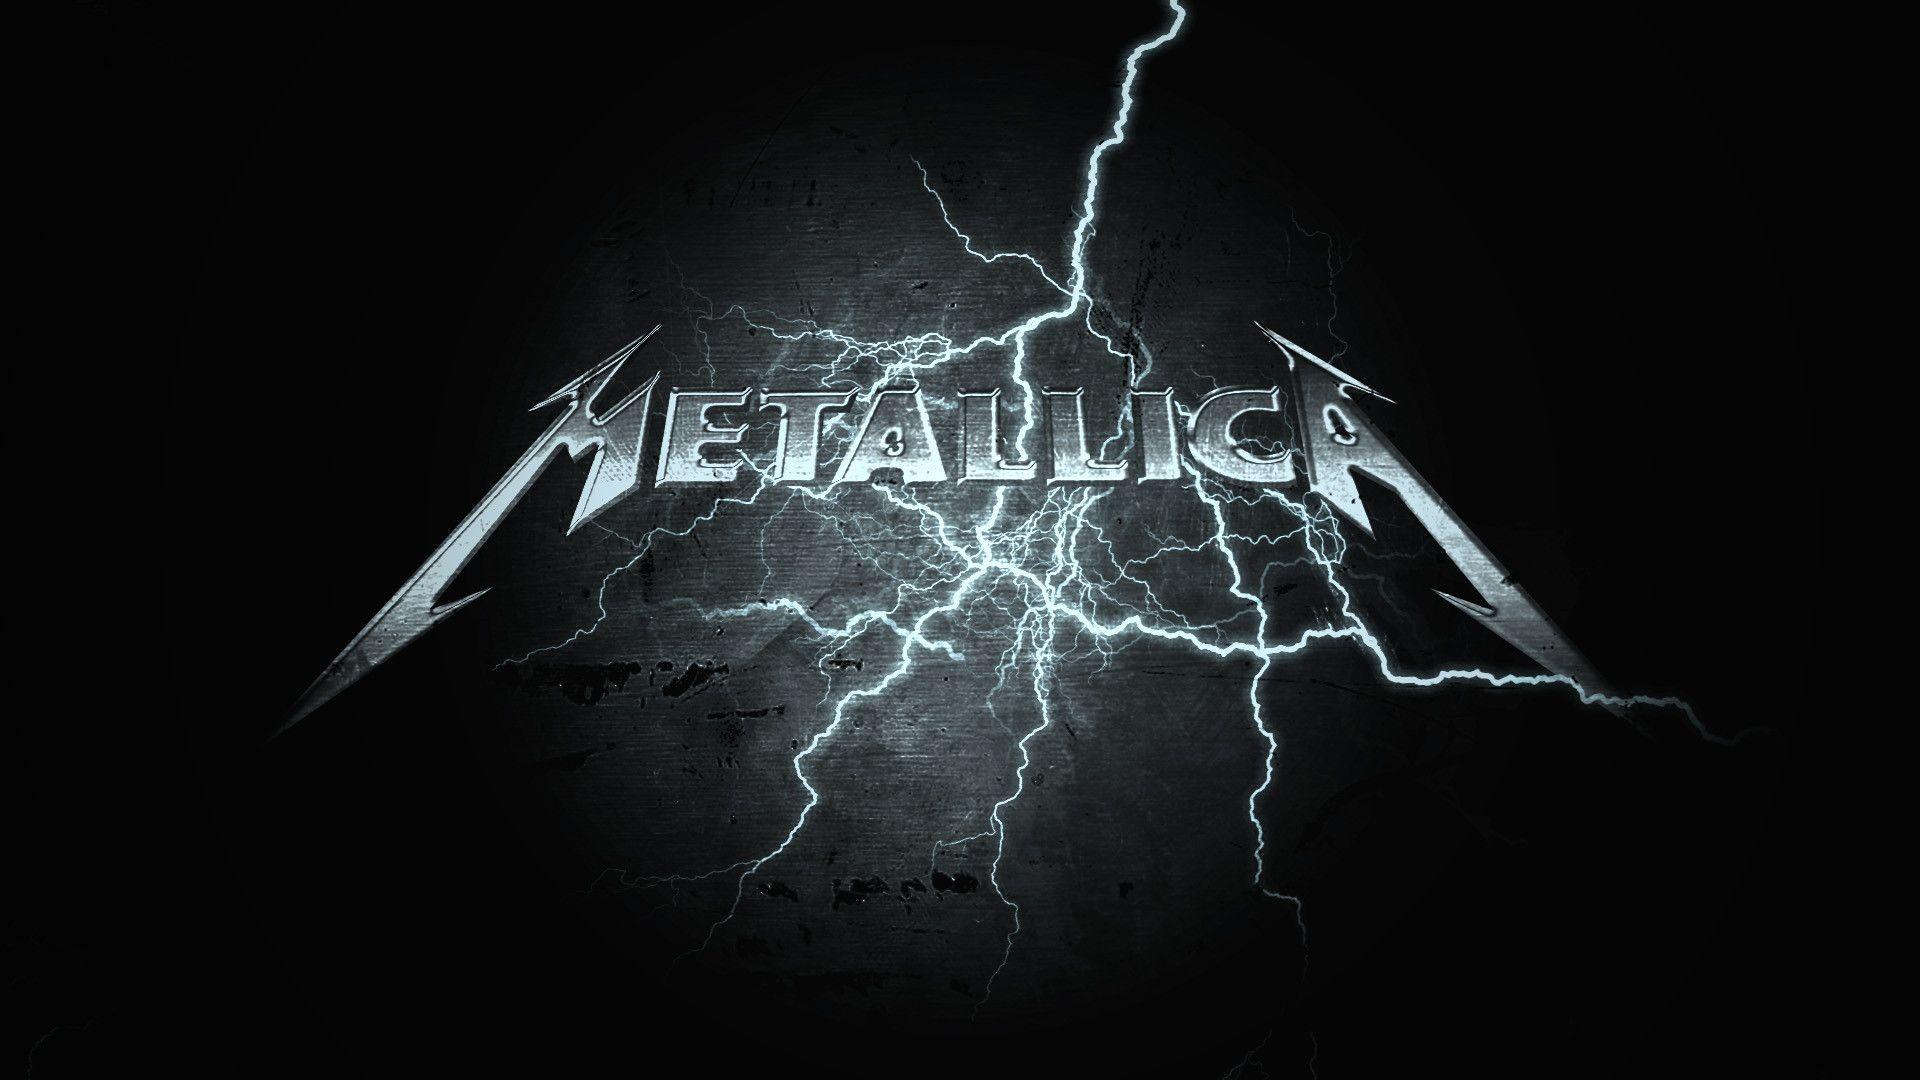 Metallica Ride The Lightning Wallpapers Hd For Desktop Wallpaper 1920 x  1080 px 623.08 KB ride